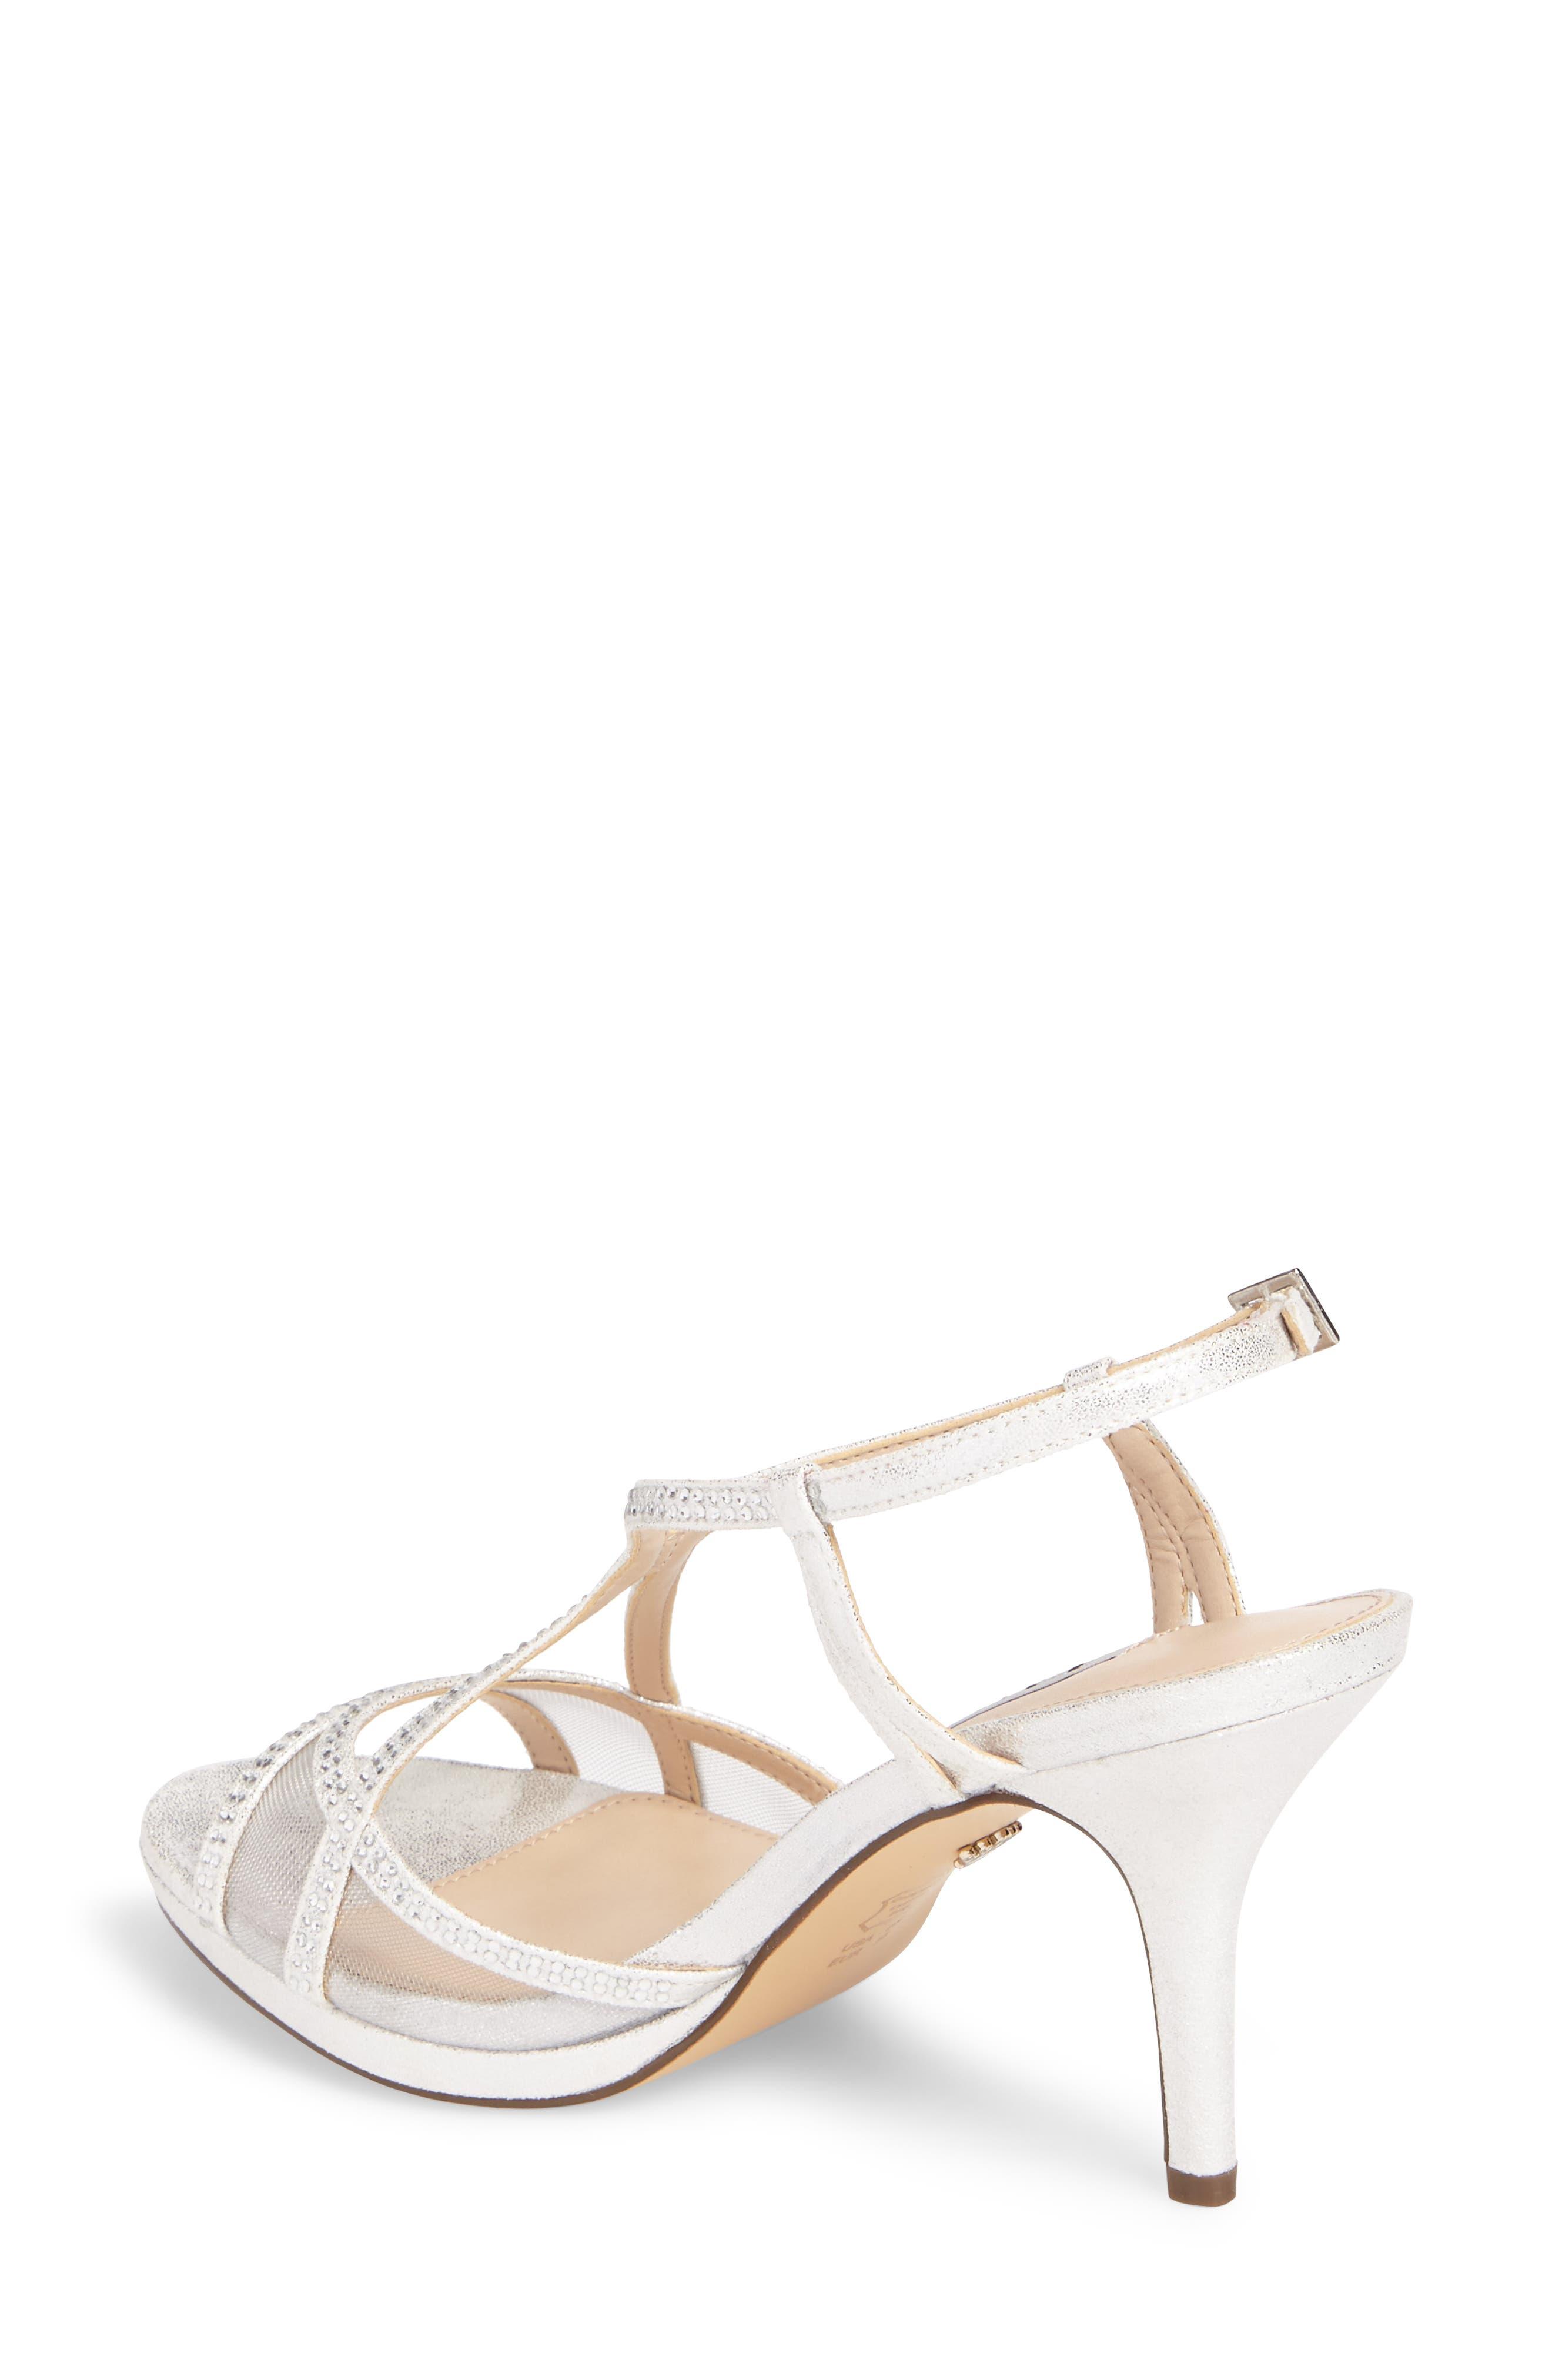 NINA, Blossom Crystal Embellished Sandal, Alternate thumbnail 2, color, SILVER FABRIC